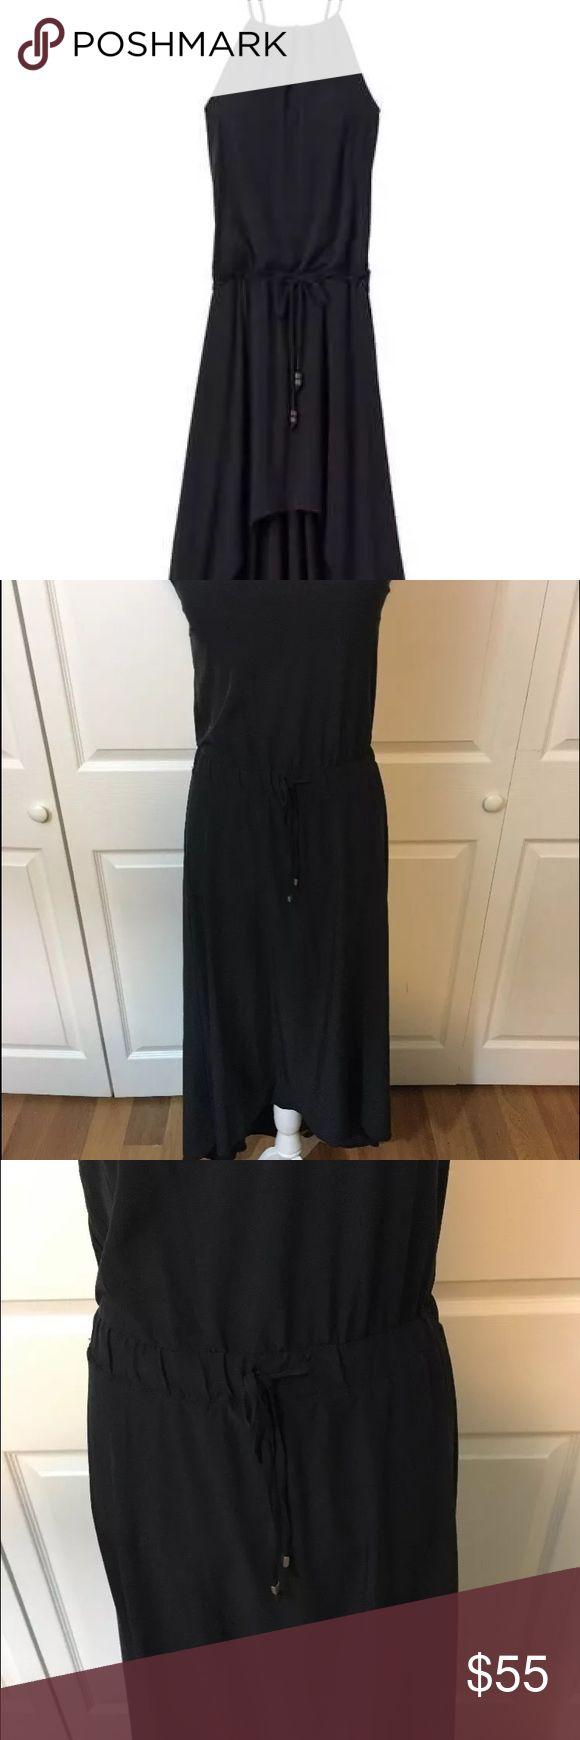 Athleta Novella Hi Low Drawstring waist Dress Hi low / Draw String Waist / Black / Size 4 / Attached Padded Bra Athleta Dresses High Low